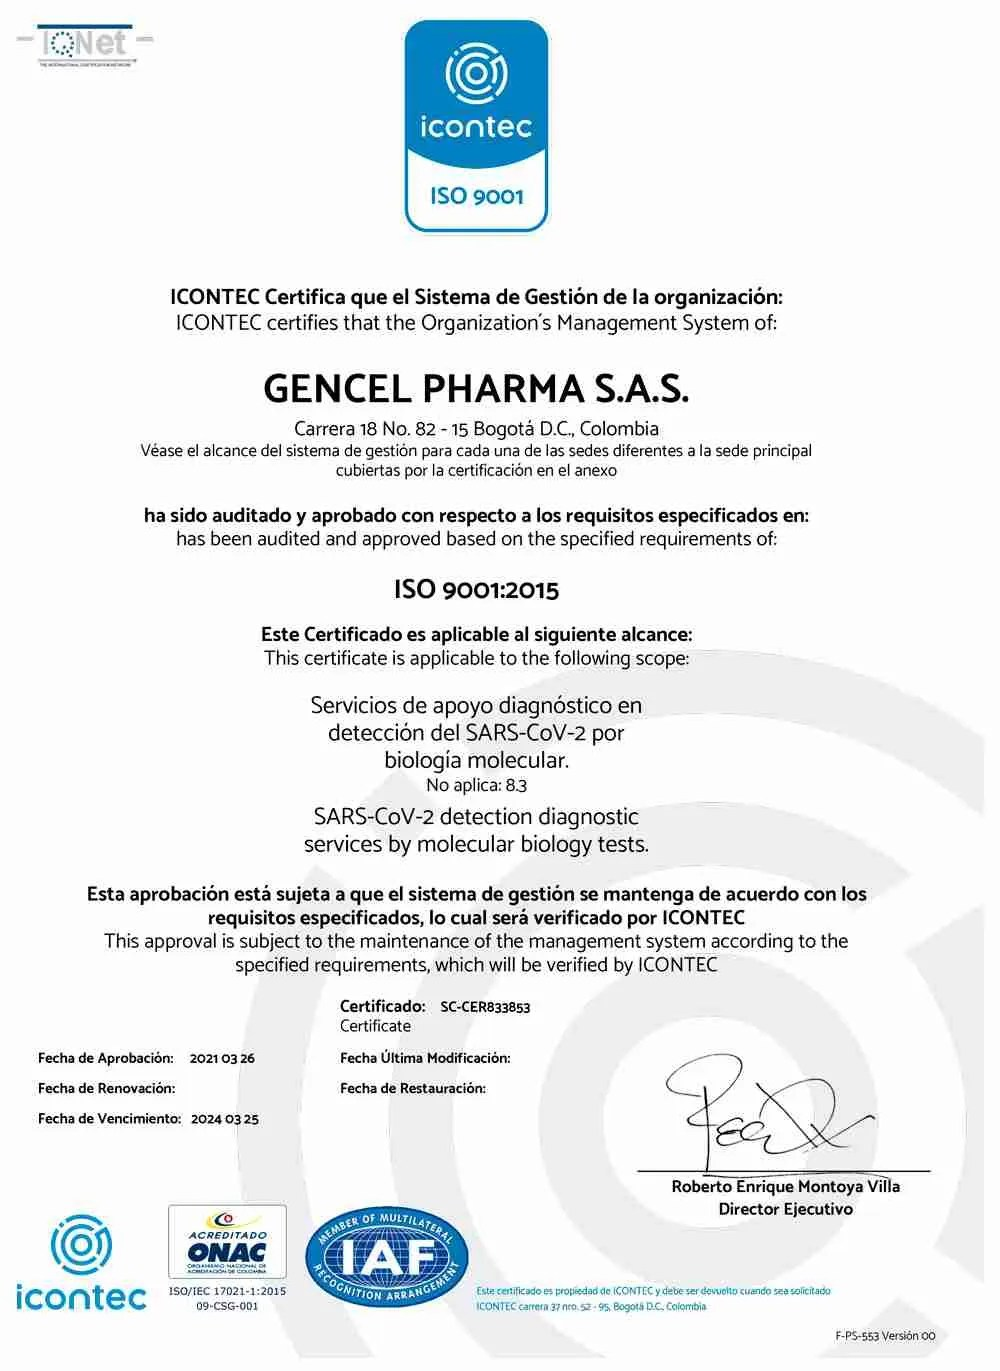 icontec ISO-9001 - Gencell Pharma